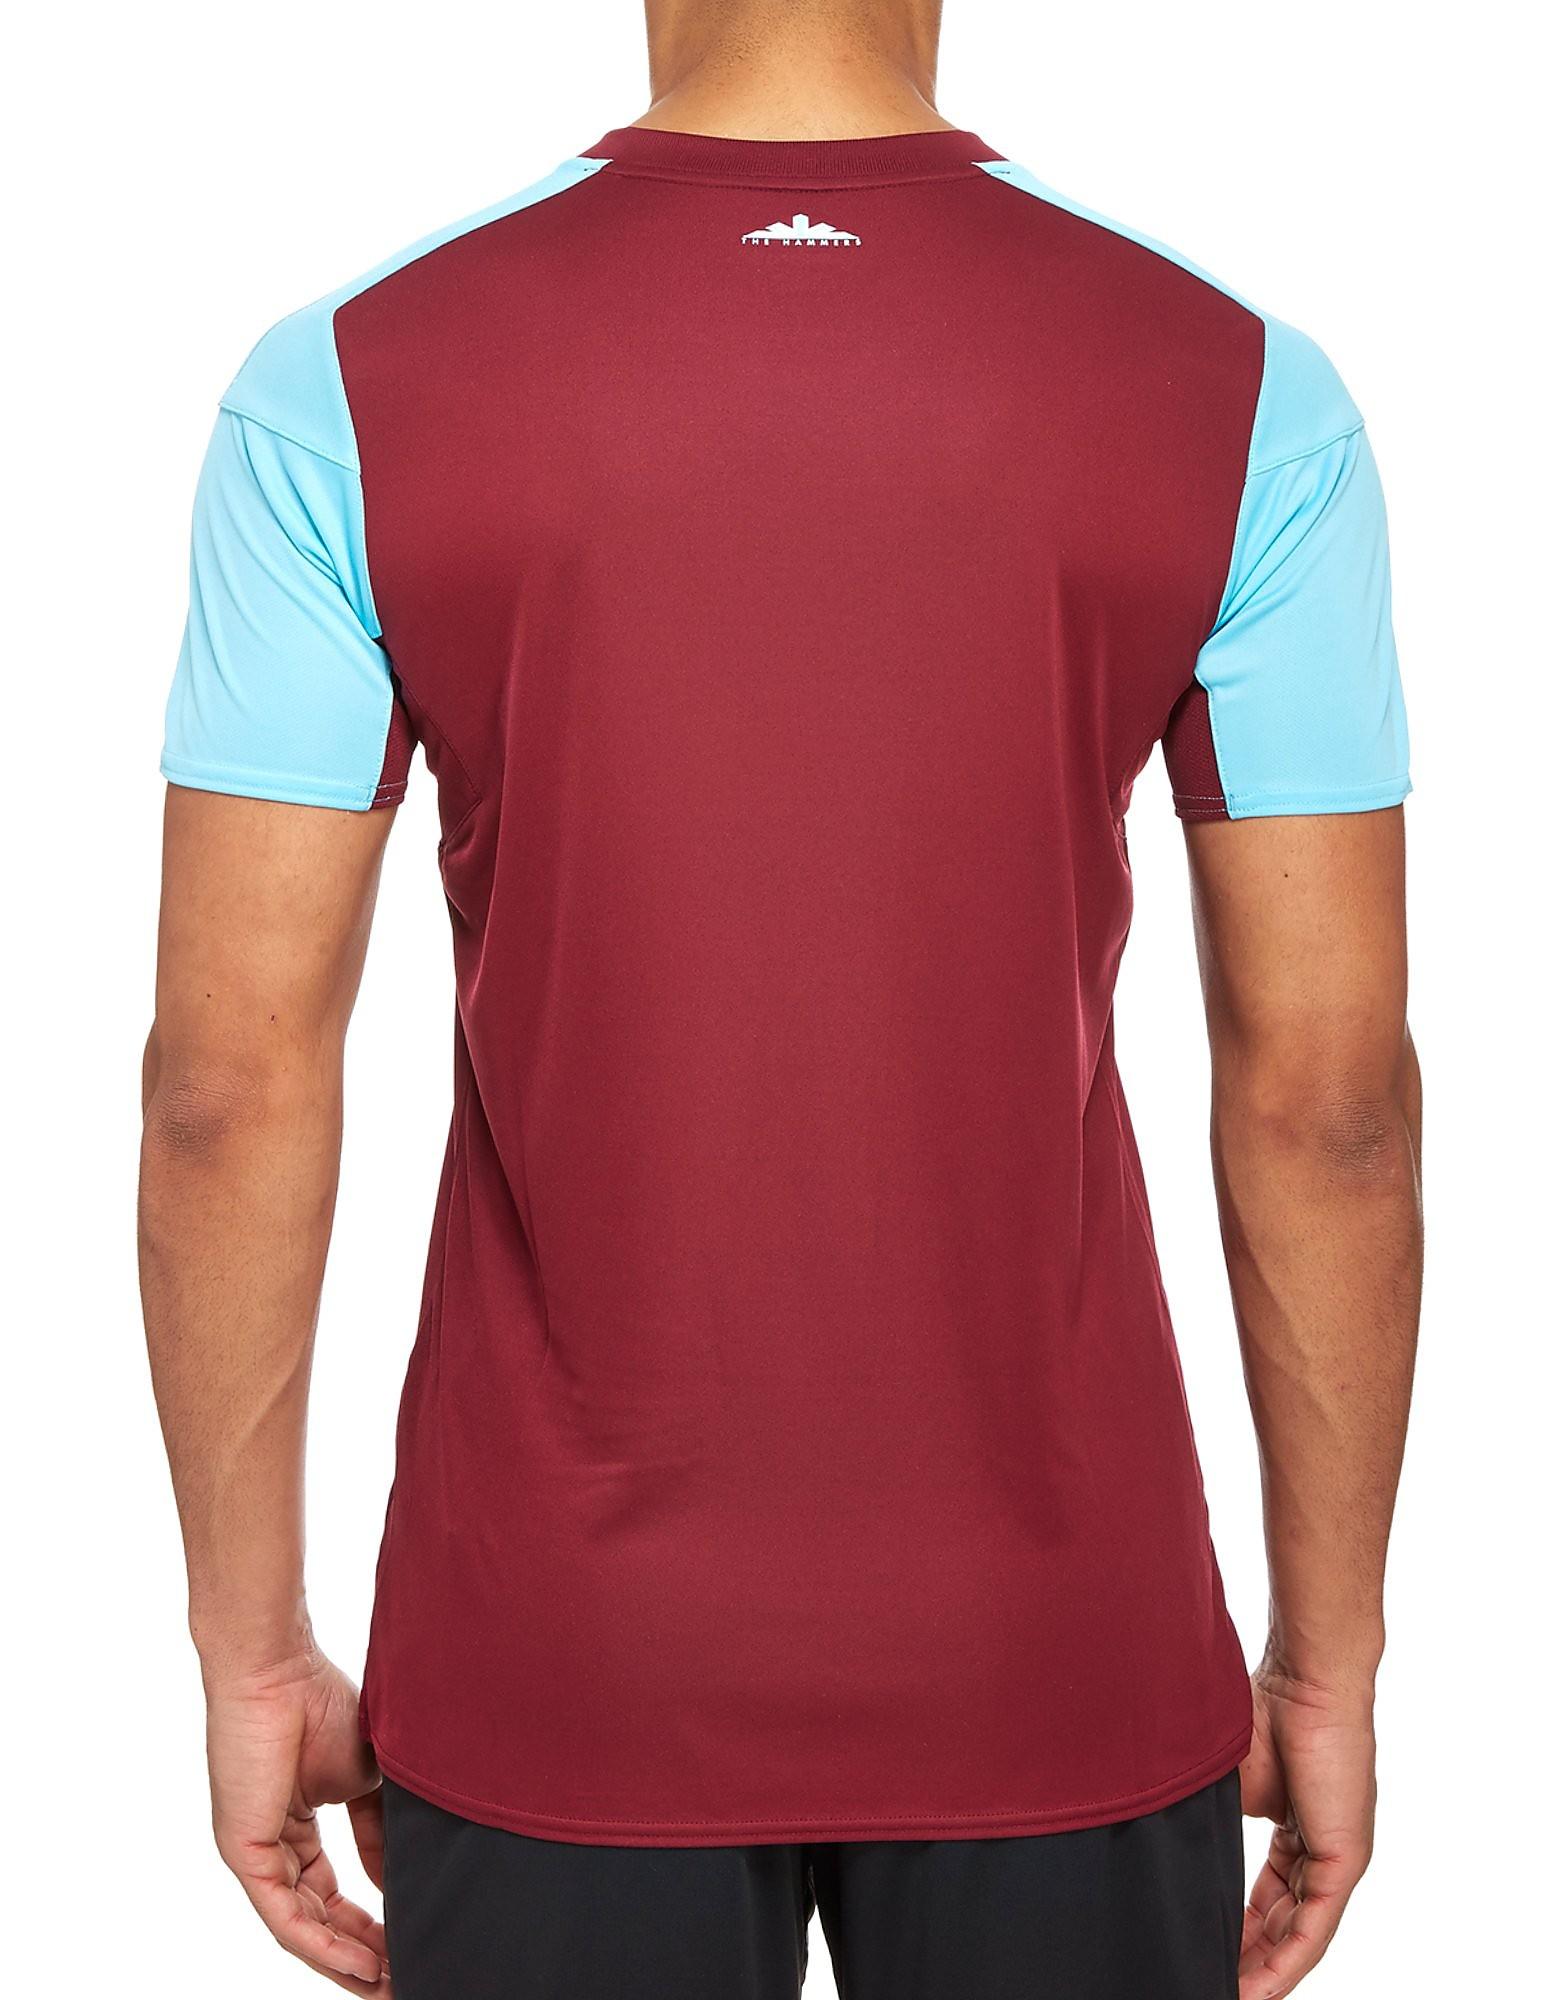 Umbro West Ham United 2017/18 Home Shirt